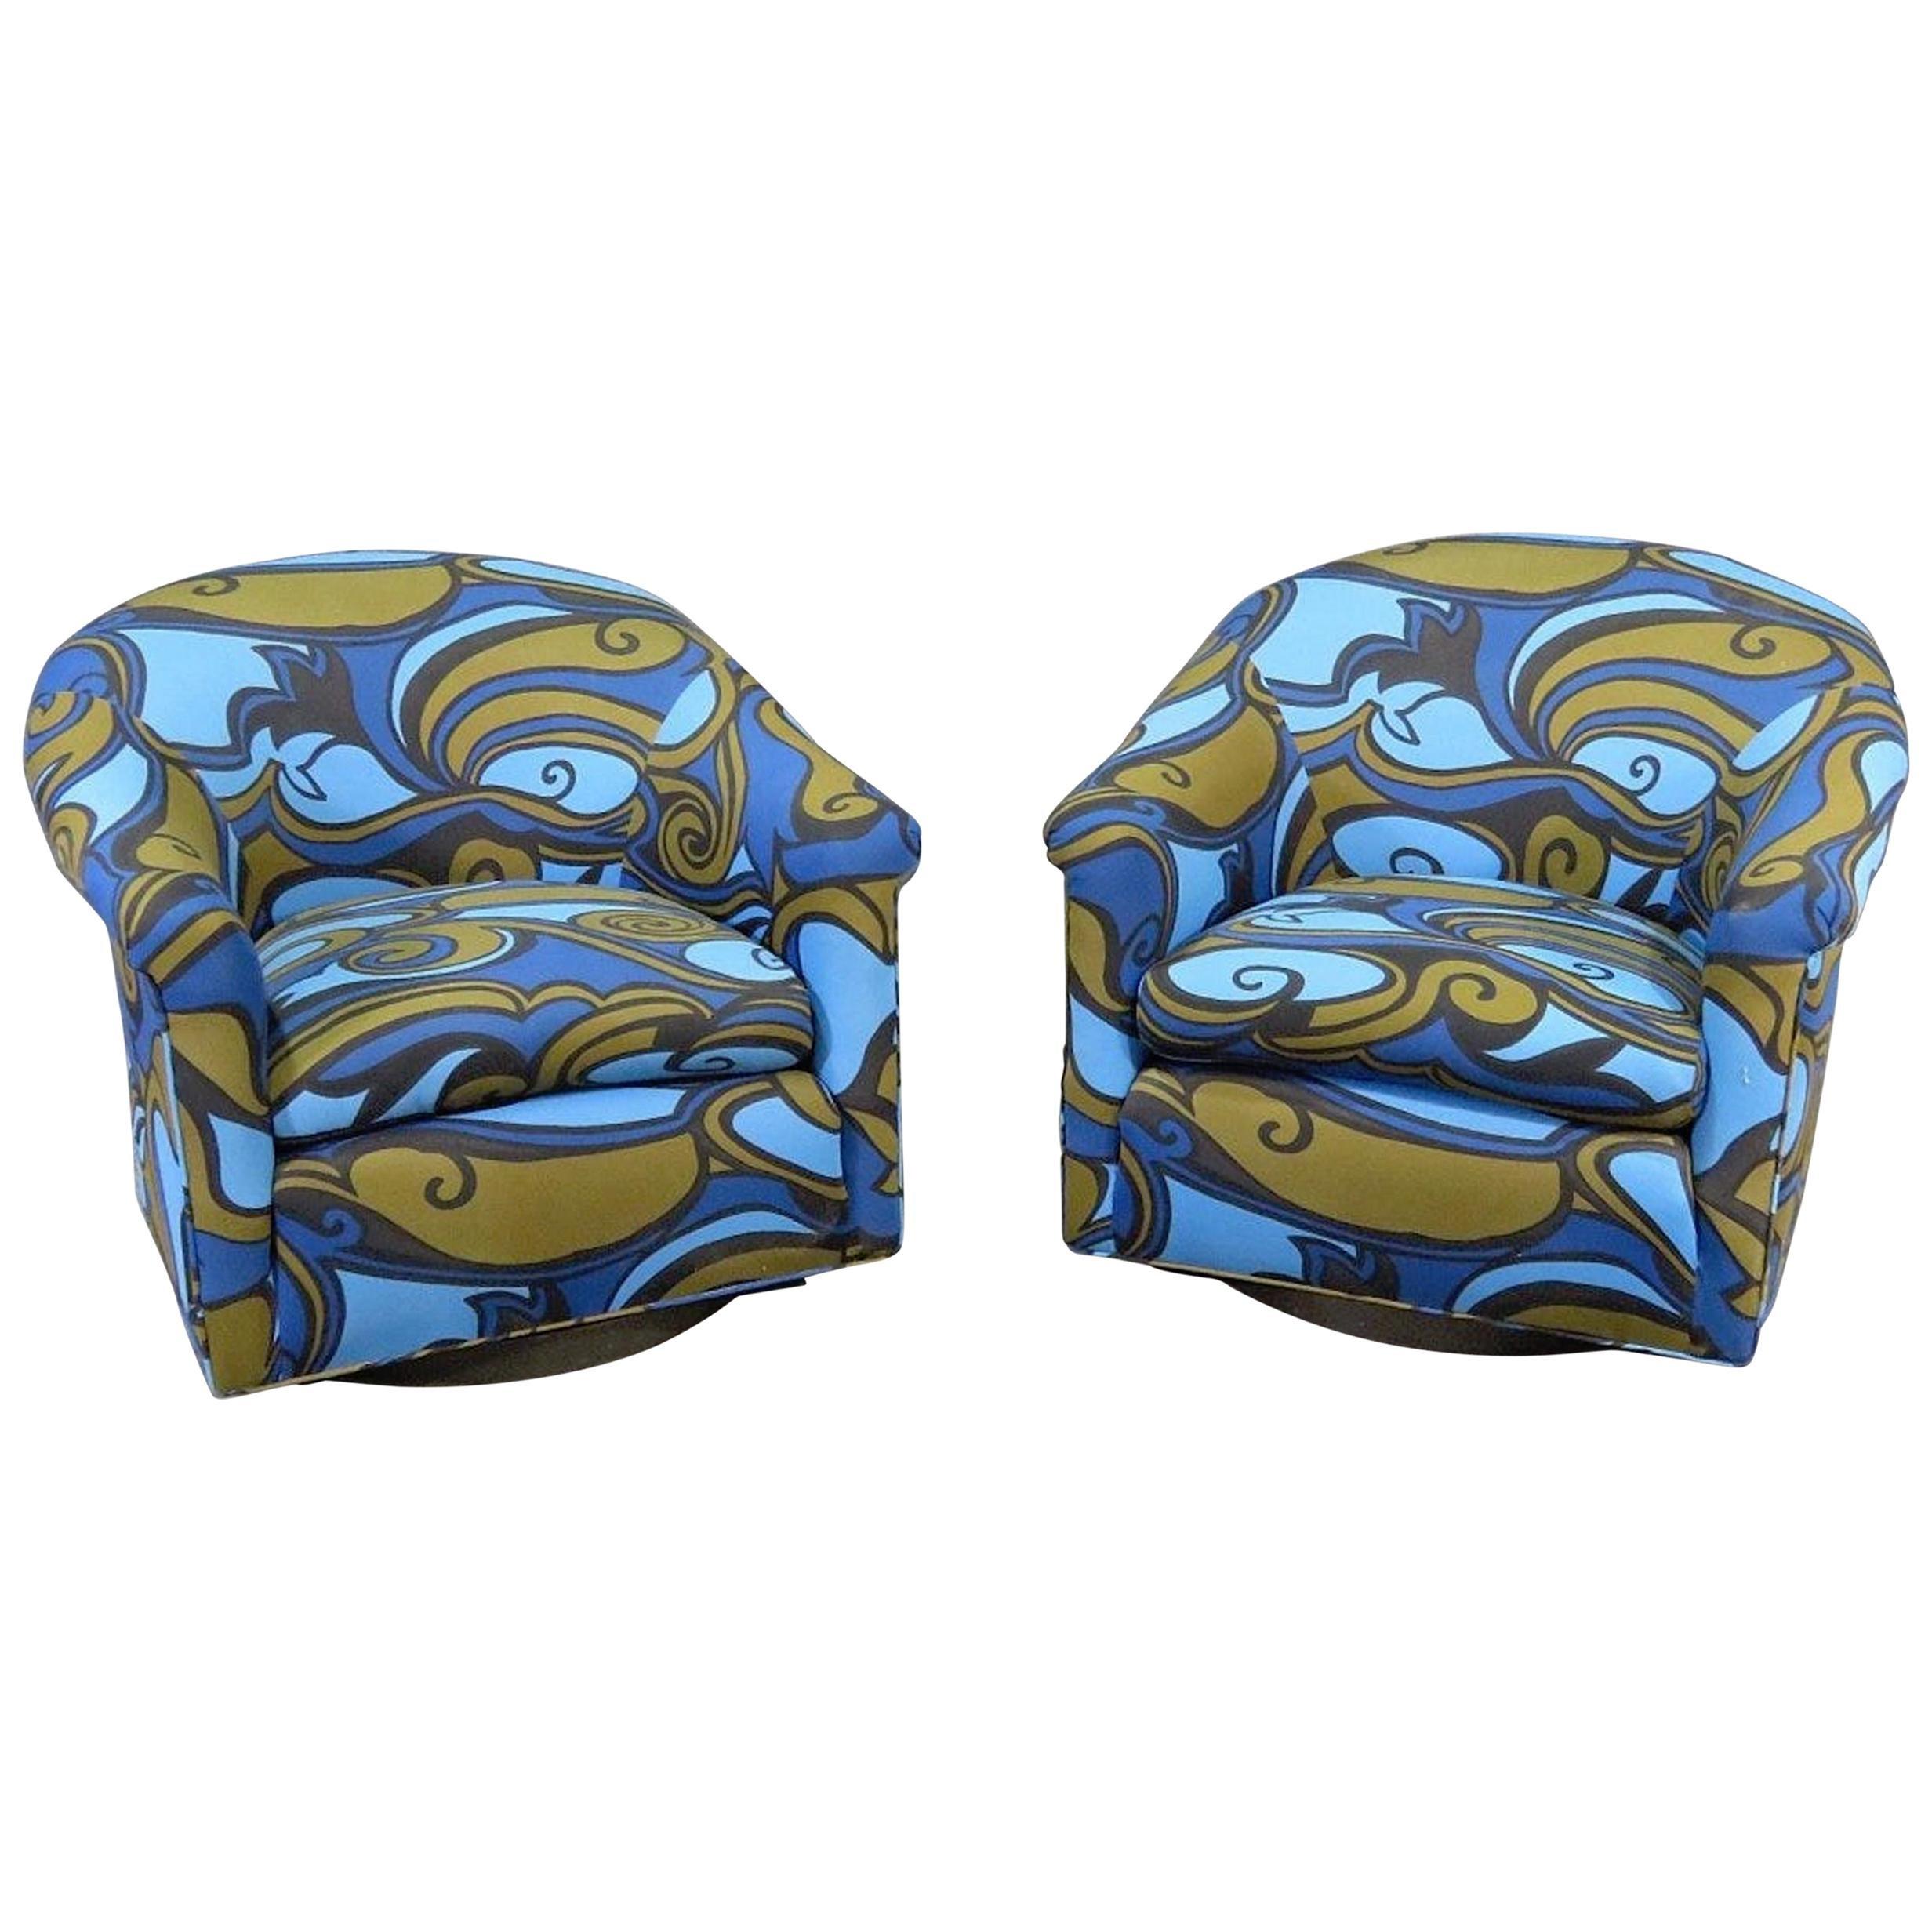 Milo Baughman Mid-Century Chairs